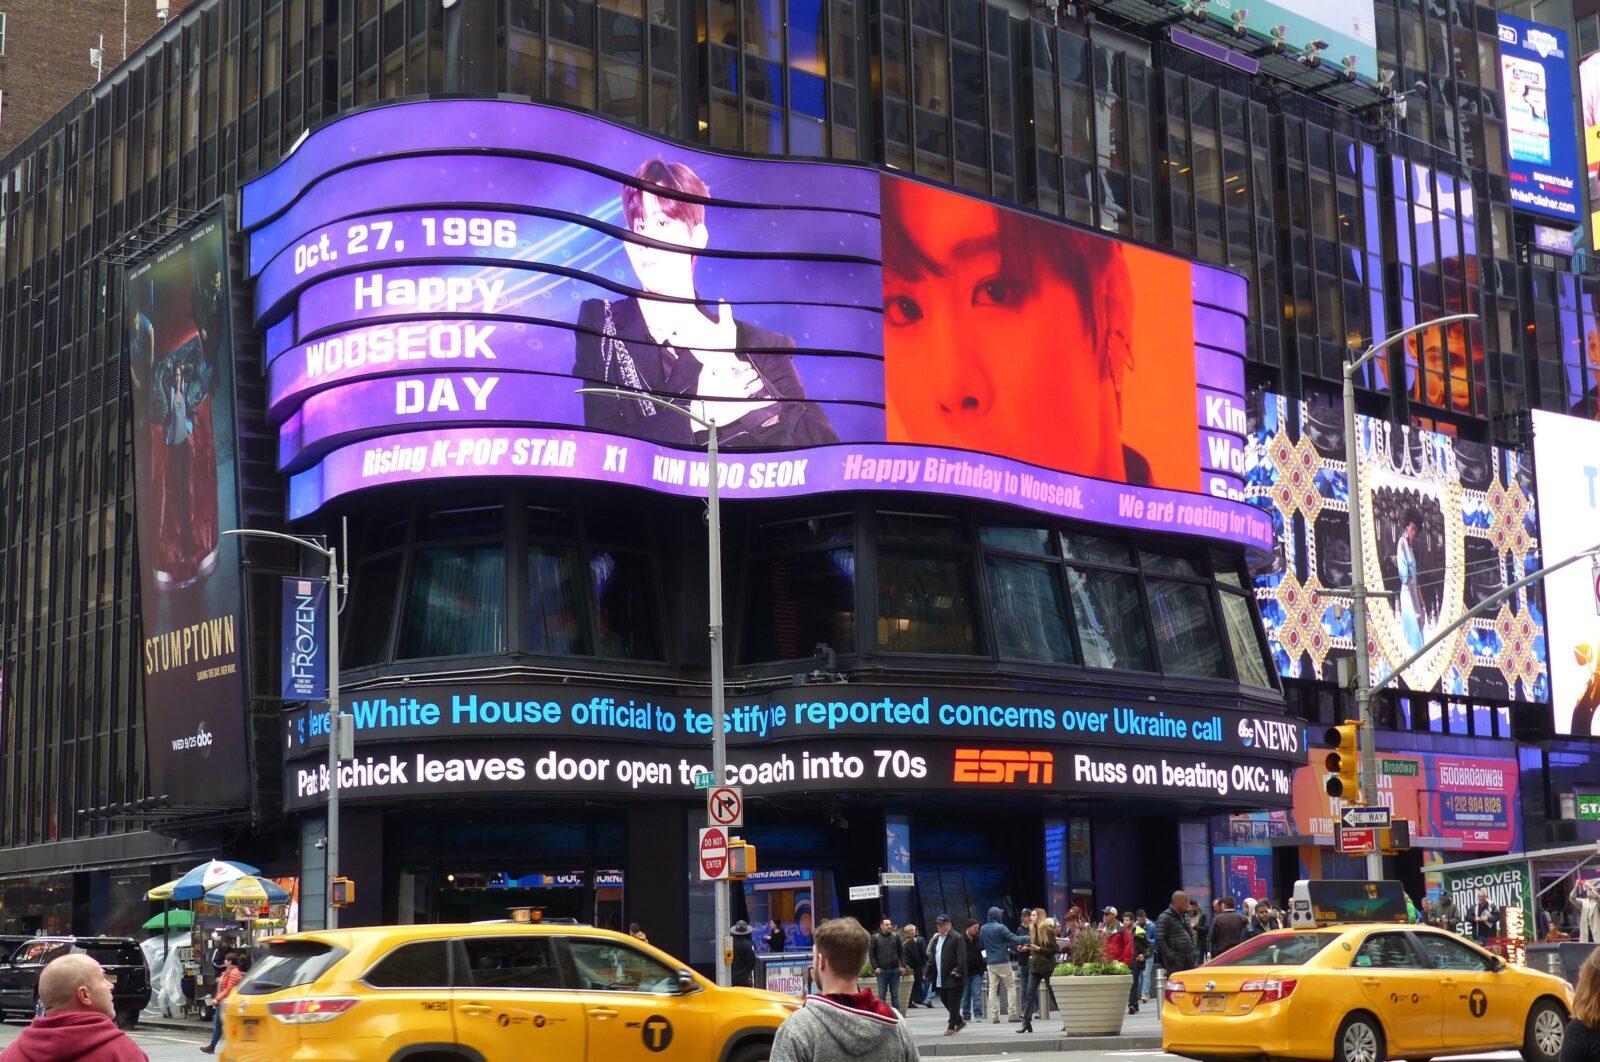 Fanmaum Inc Kim Woo Seok Times Square ABC Supersign Advertising